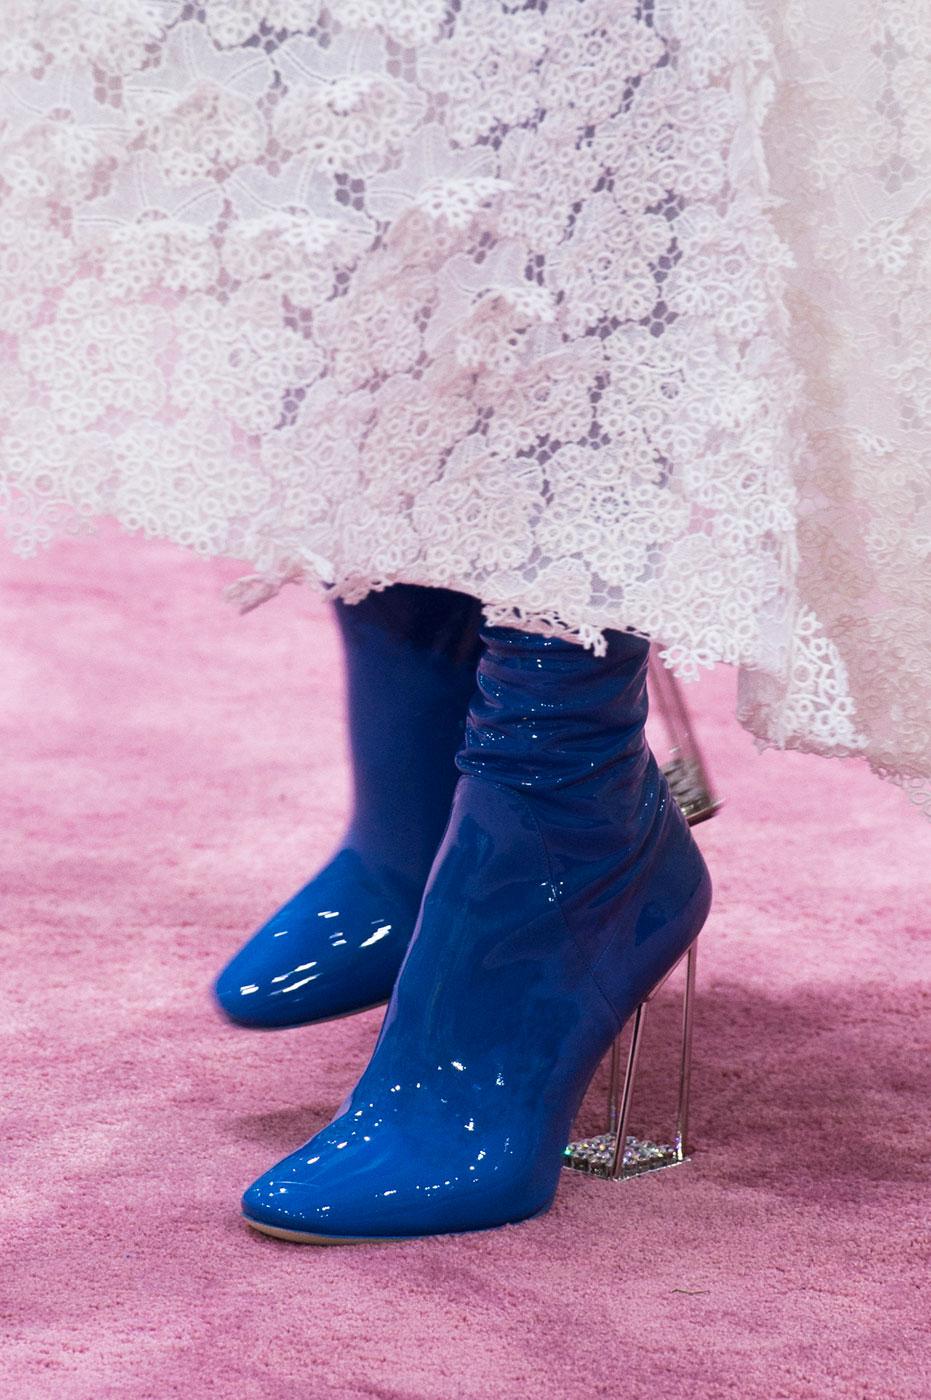 Christian-Dior-fashion-runway-show-close-ups-haute-couture-paris-spring-summer-2015-the-impression-204